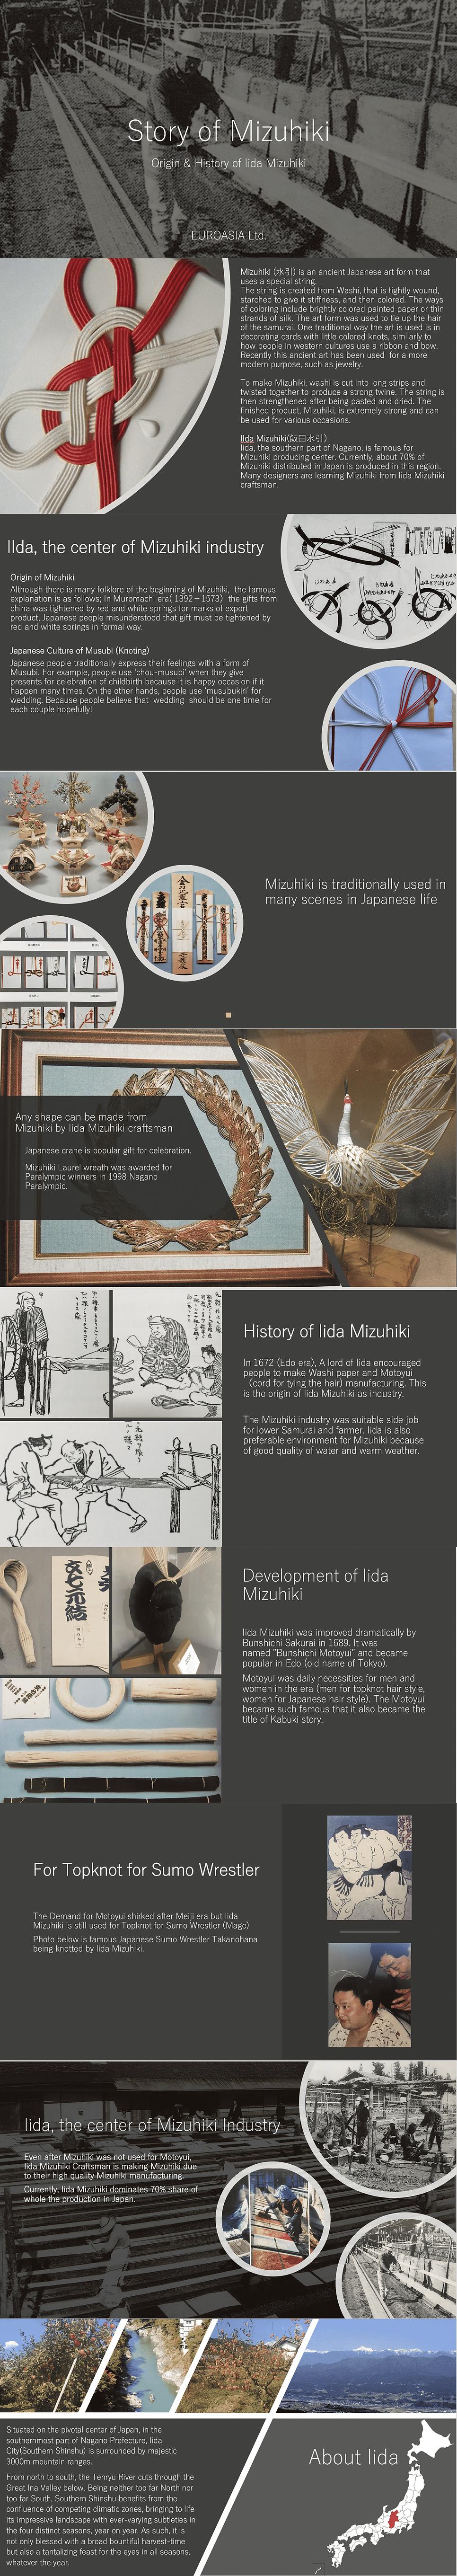 Story of Mizuhiki (1) (1) (2) (1) (1) (1